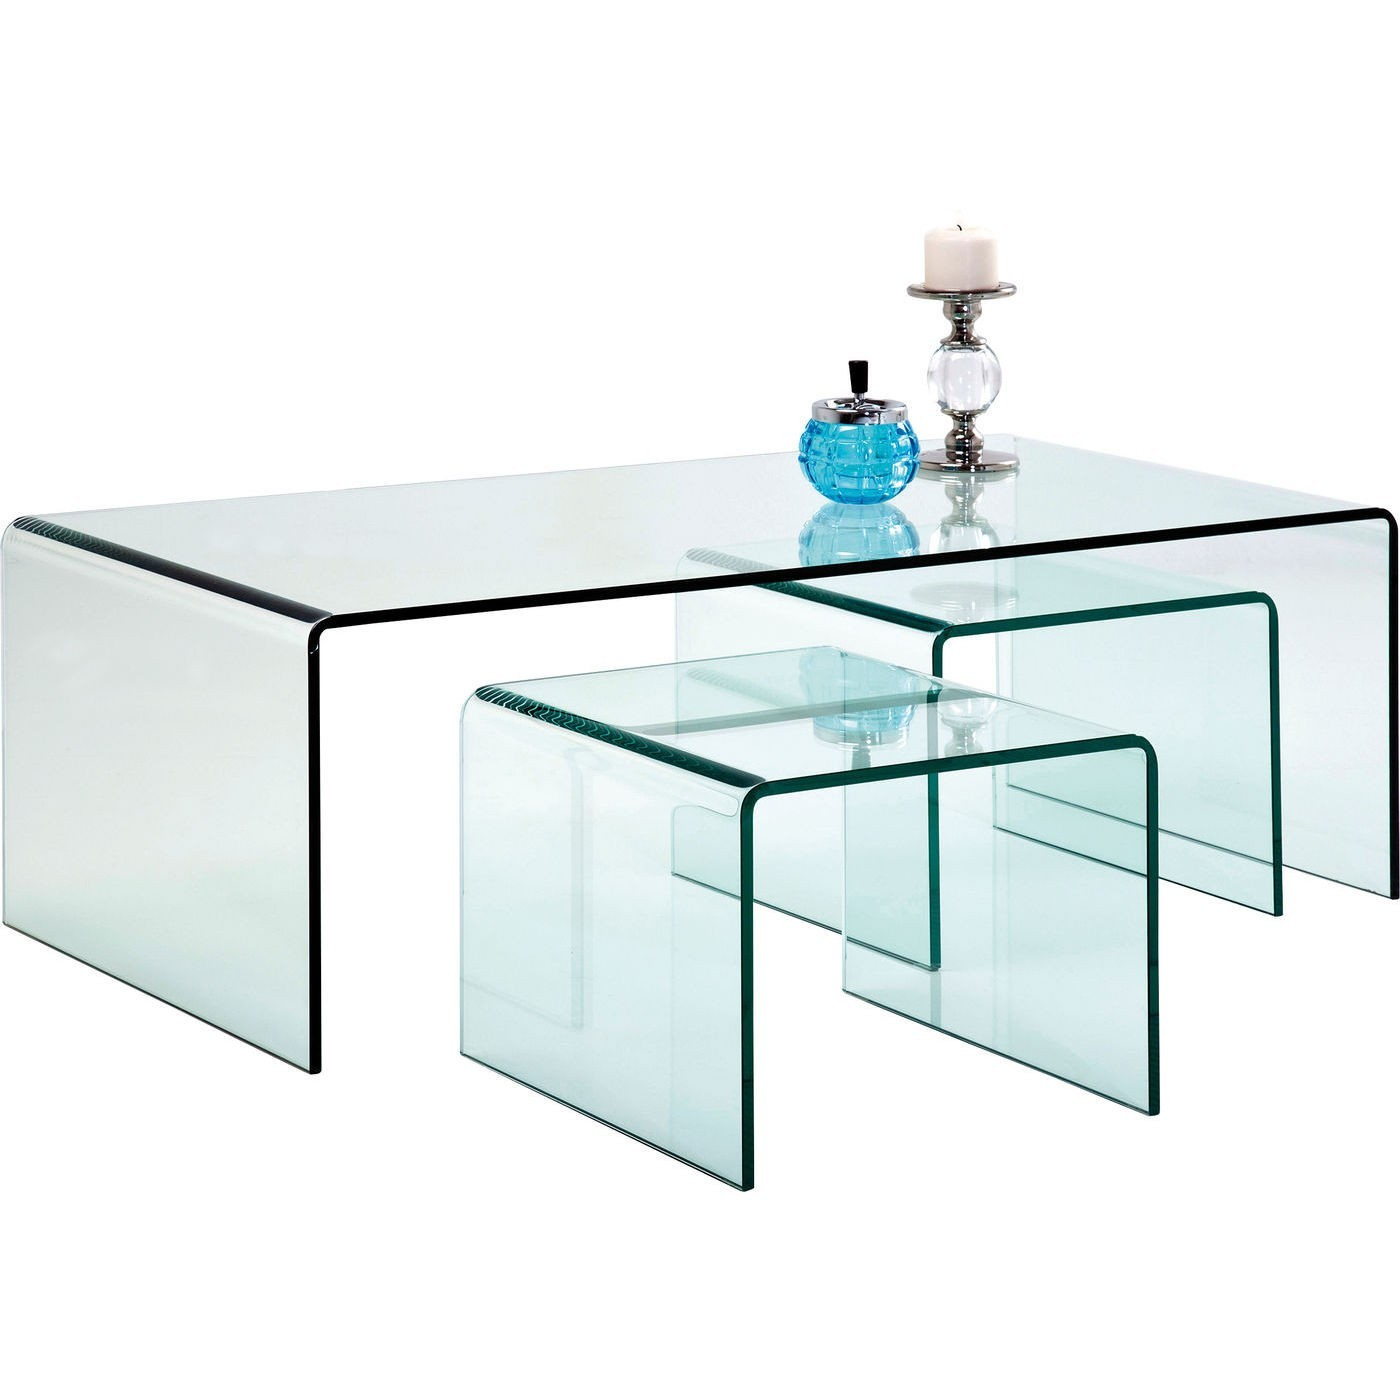 3 tables basses en verre